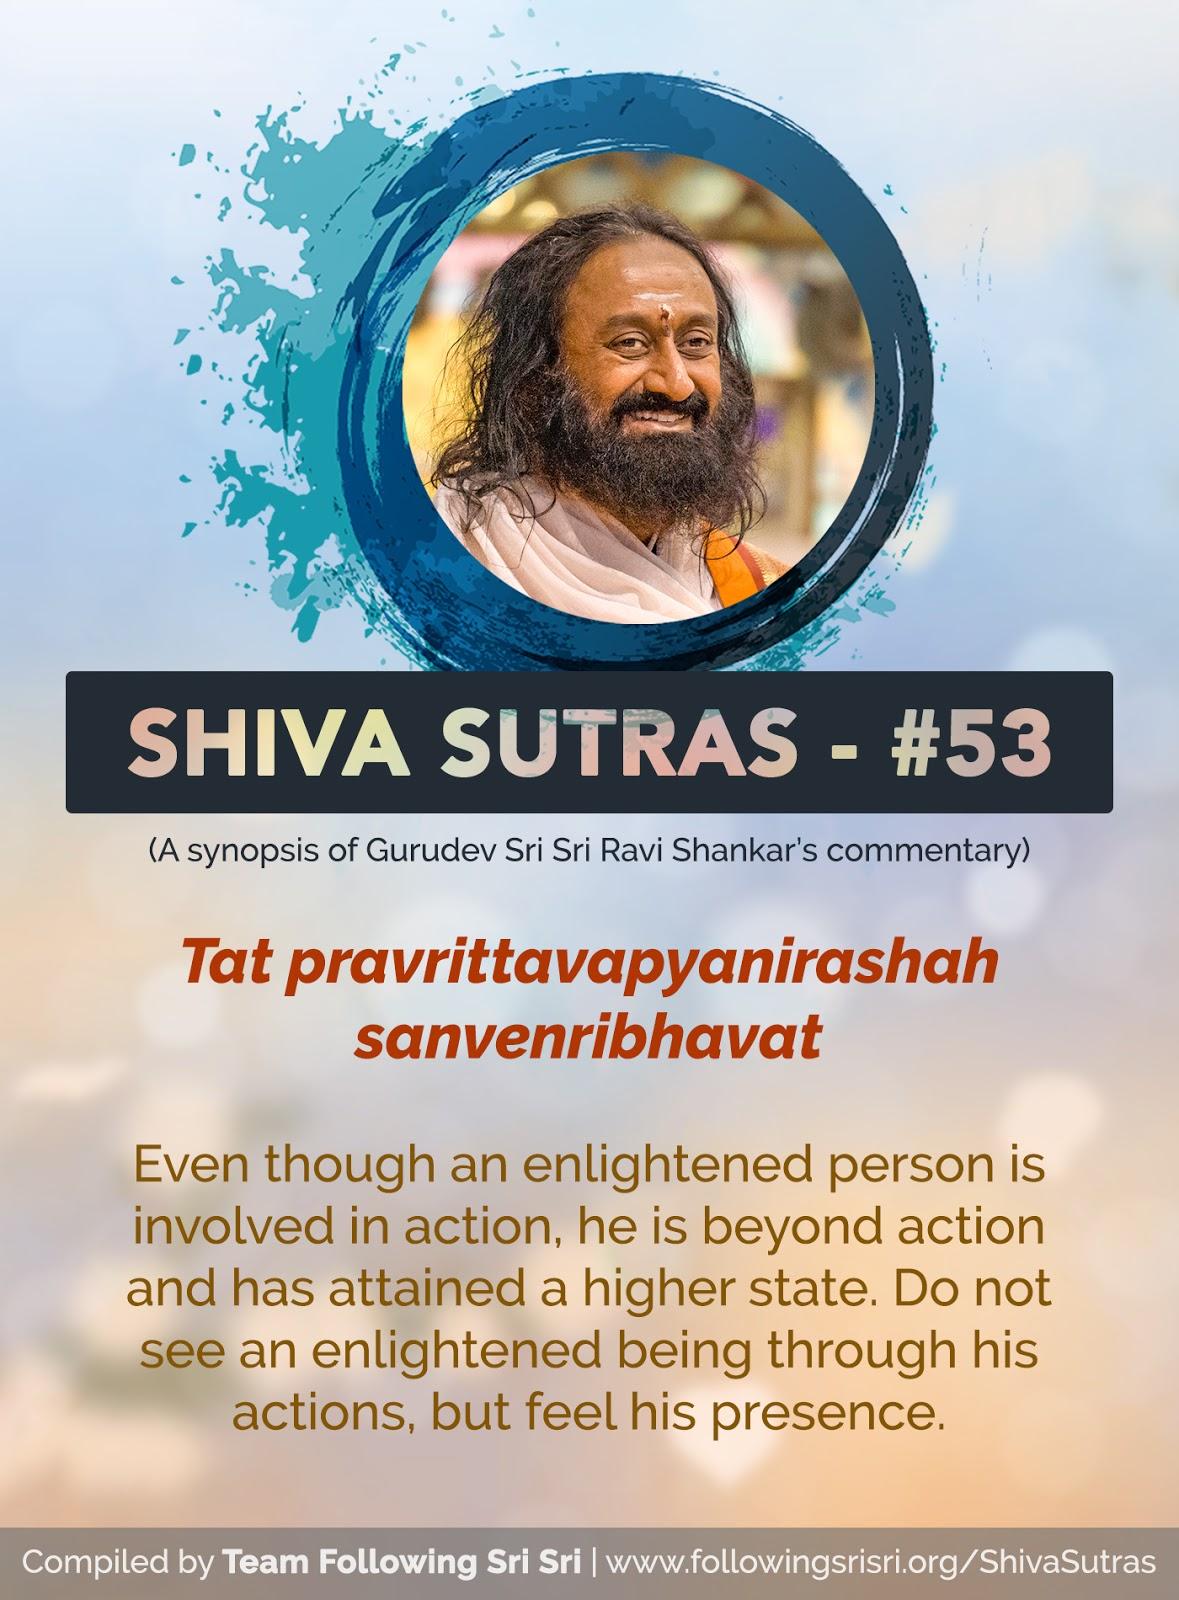 Shiva Sutras - Sutra 53